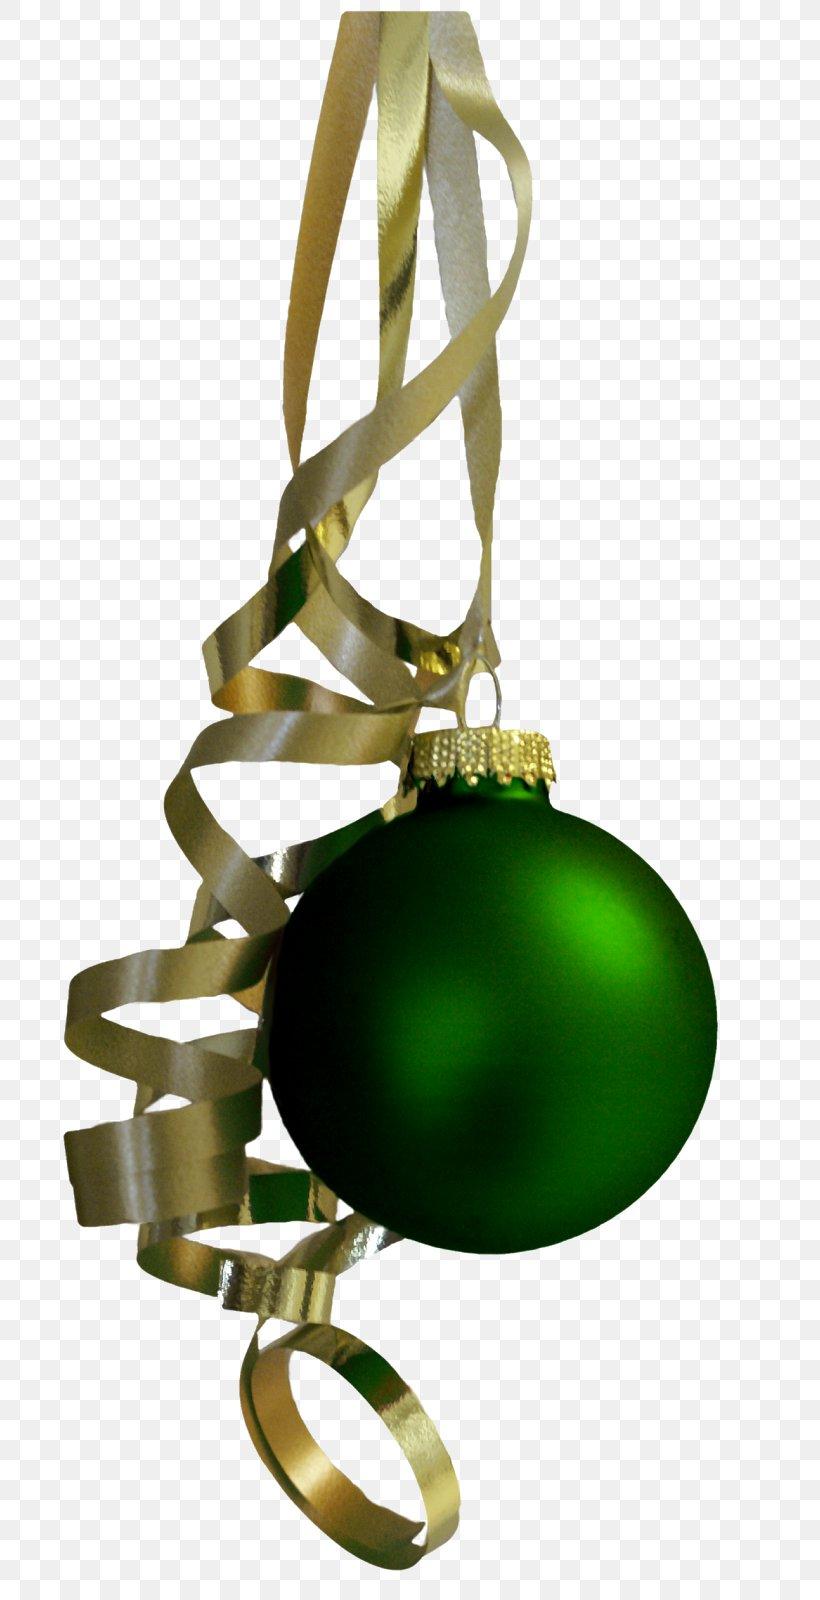 Christmas Ornament Bombka Christmas Tree Clip Art, PNG, 790x1600px, Christmas, Advent, Biblical Magi, Bombka, Christmas Card Download Free